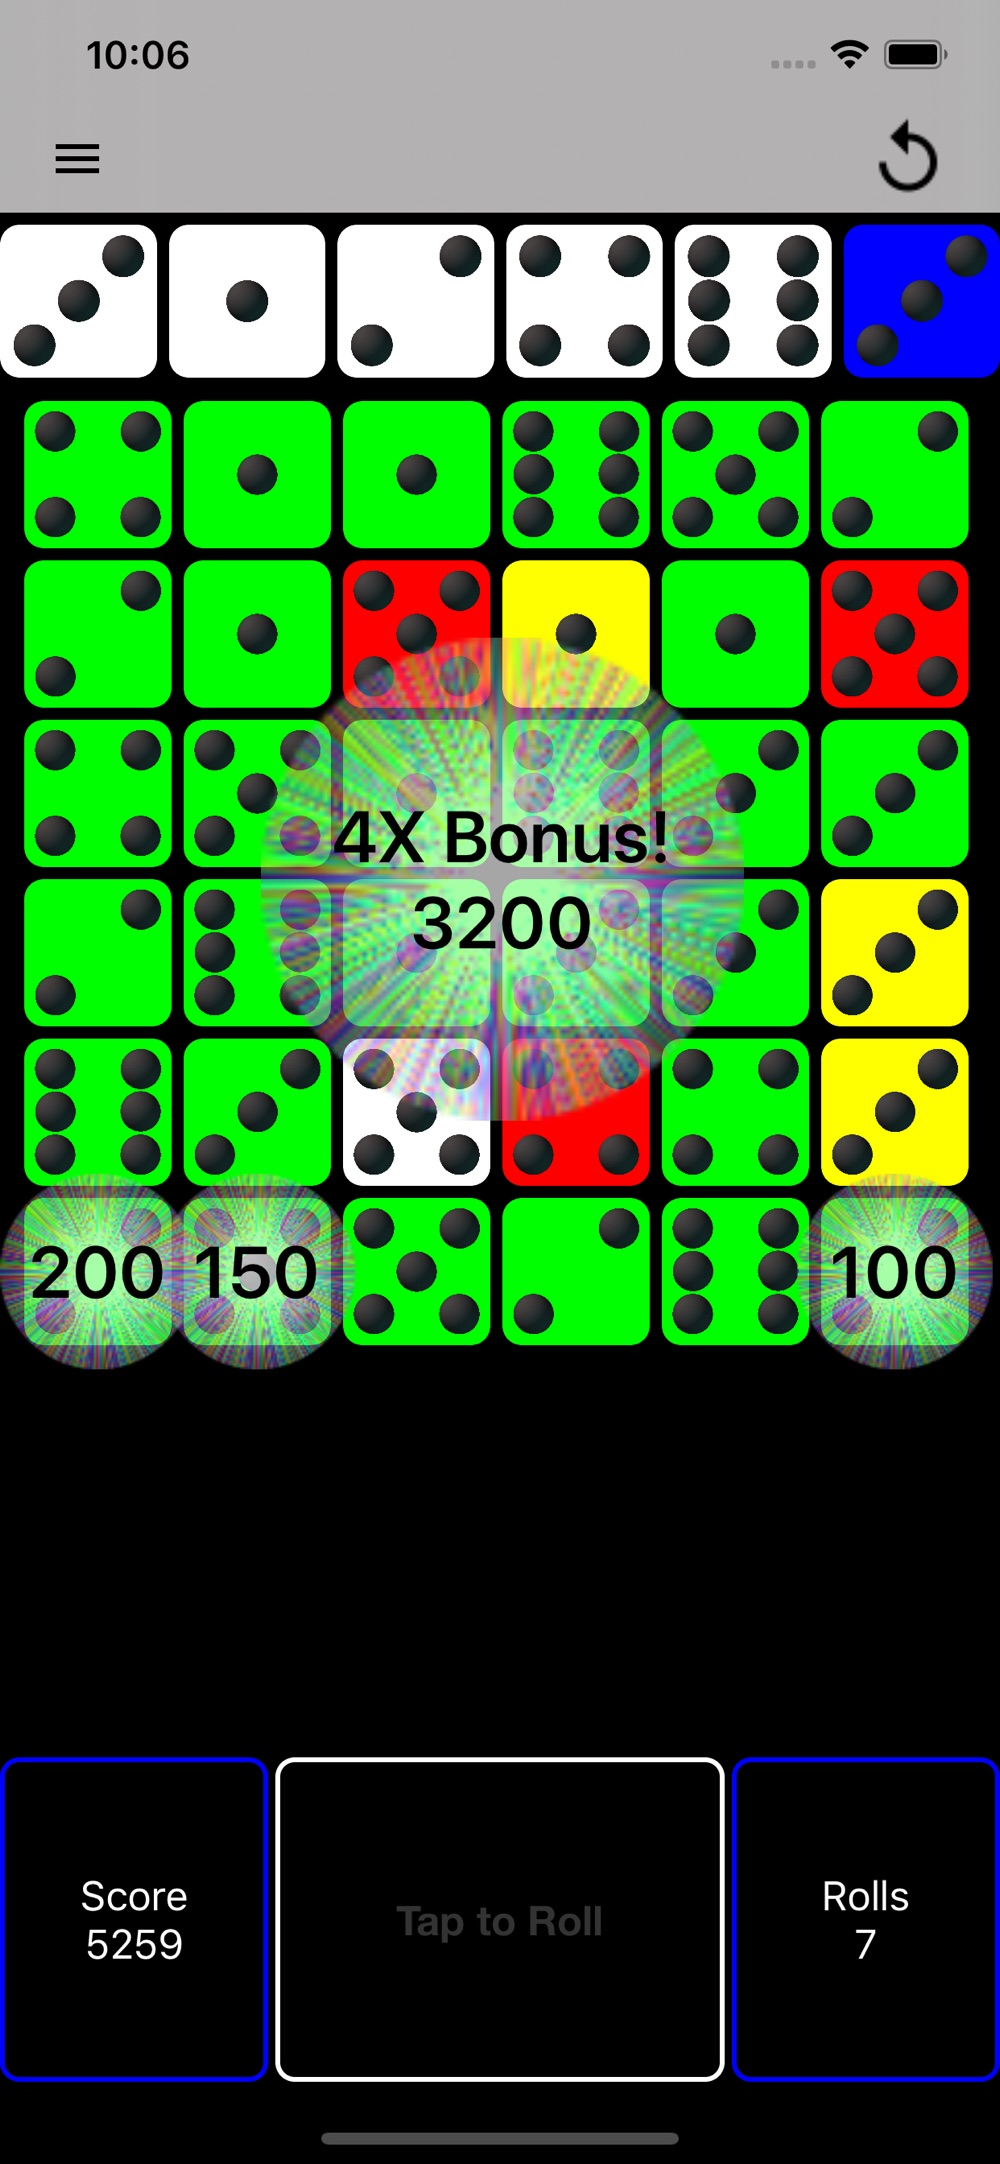 Dice Match Bingo hack tool